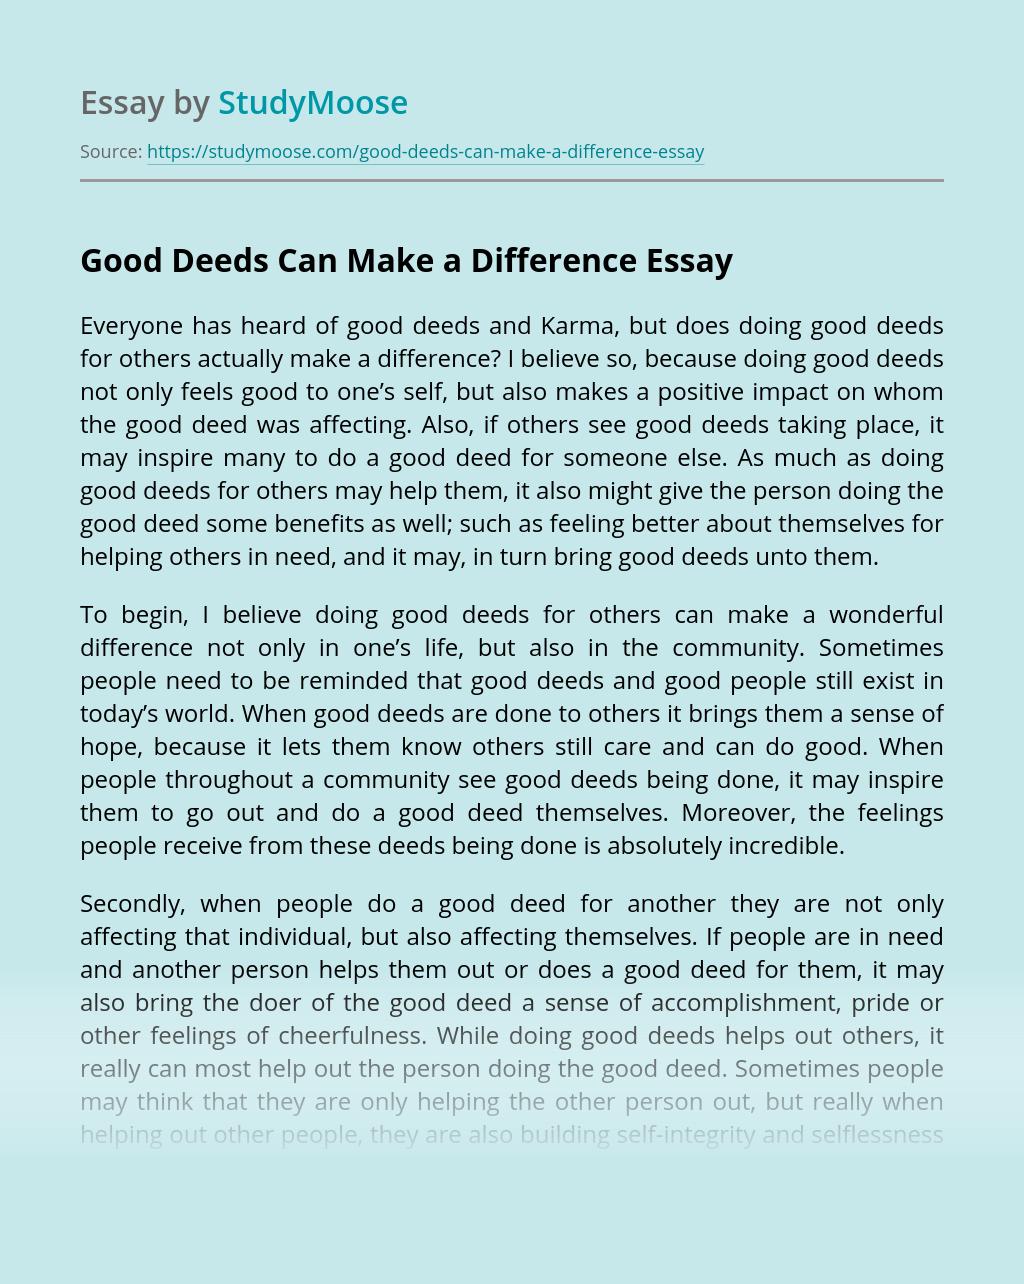 Do Good Have Good Essay